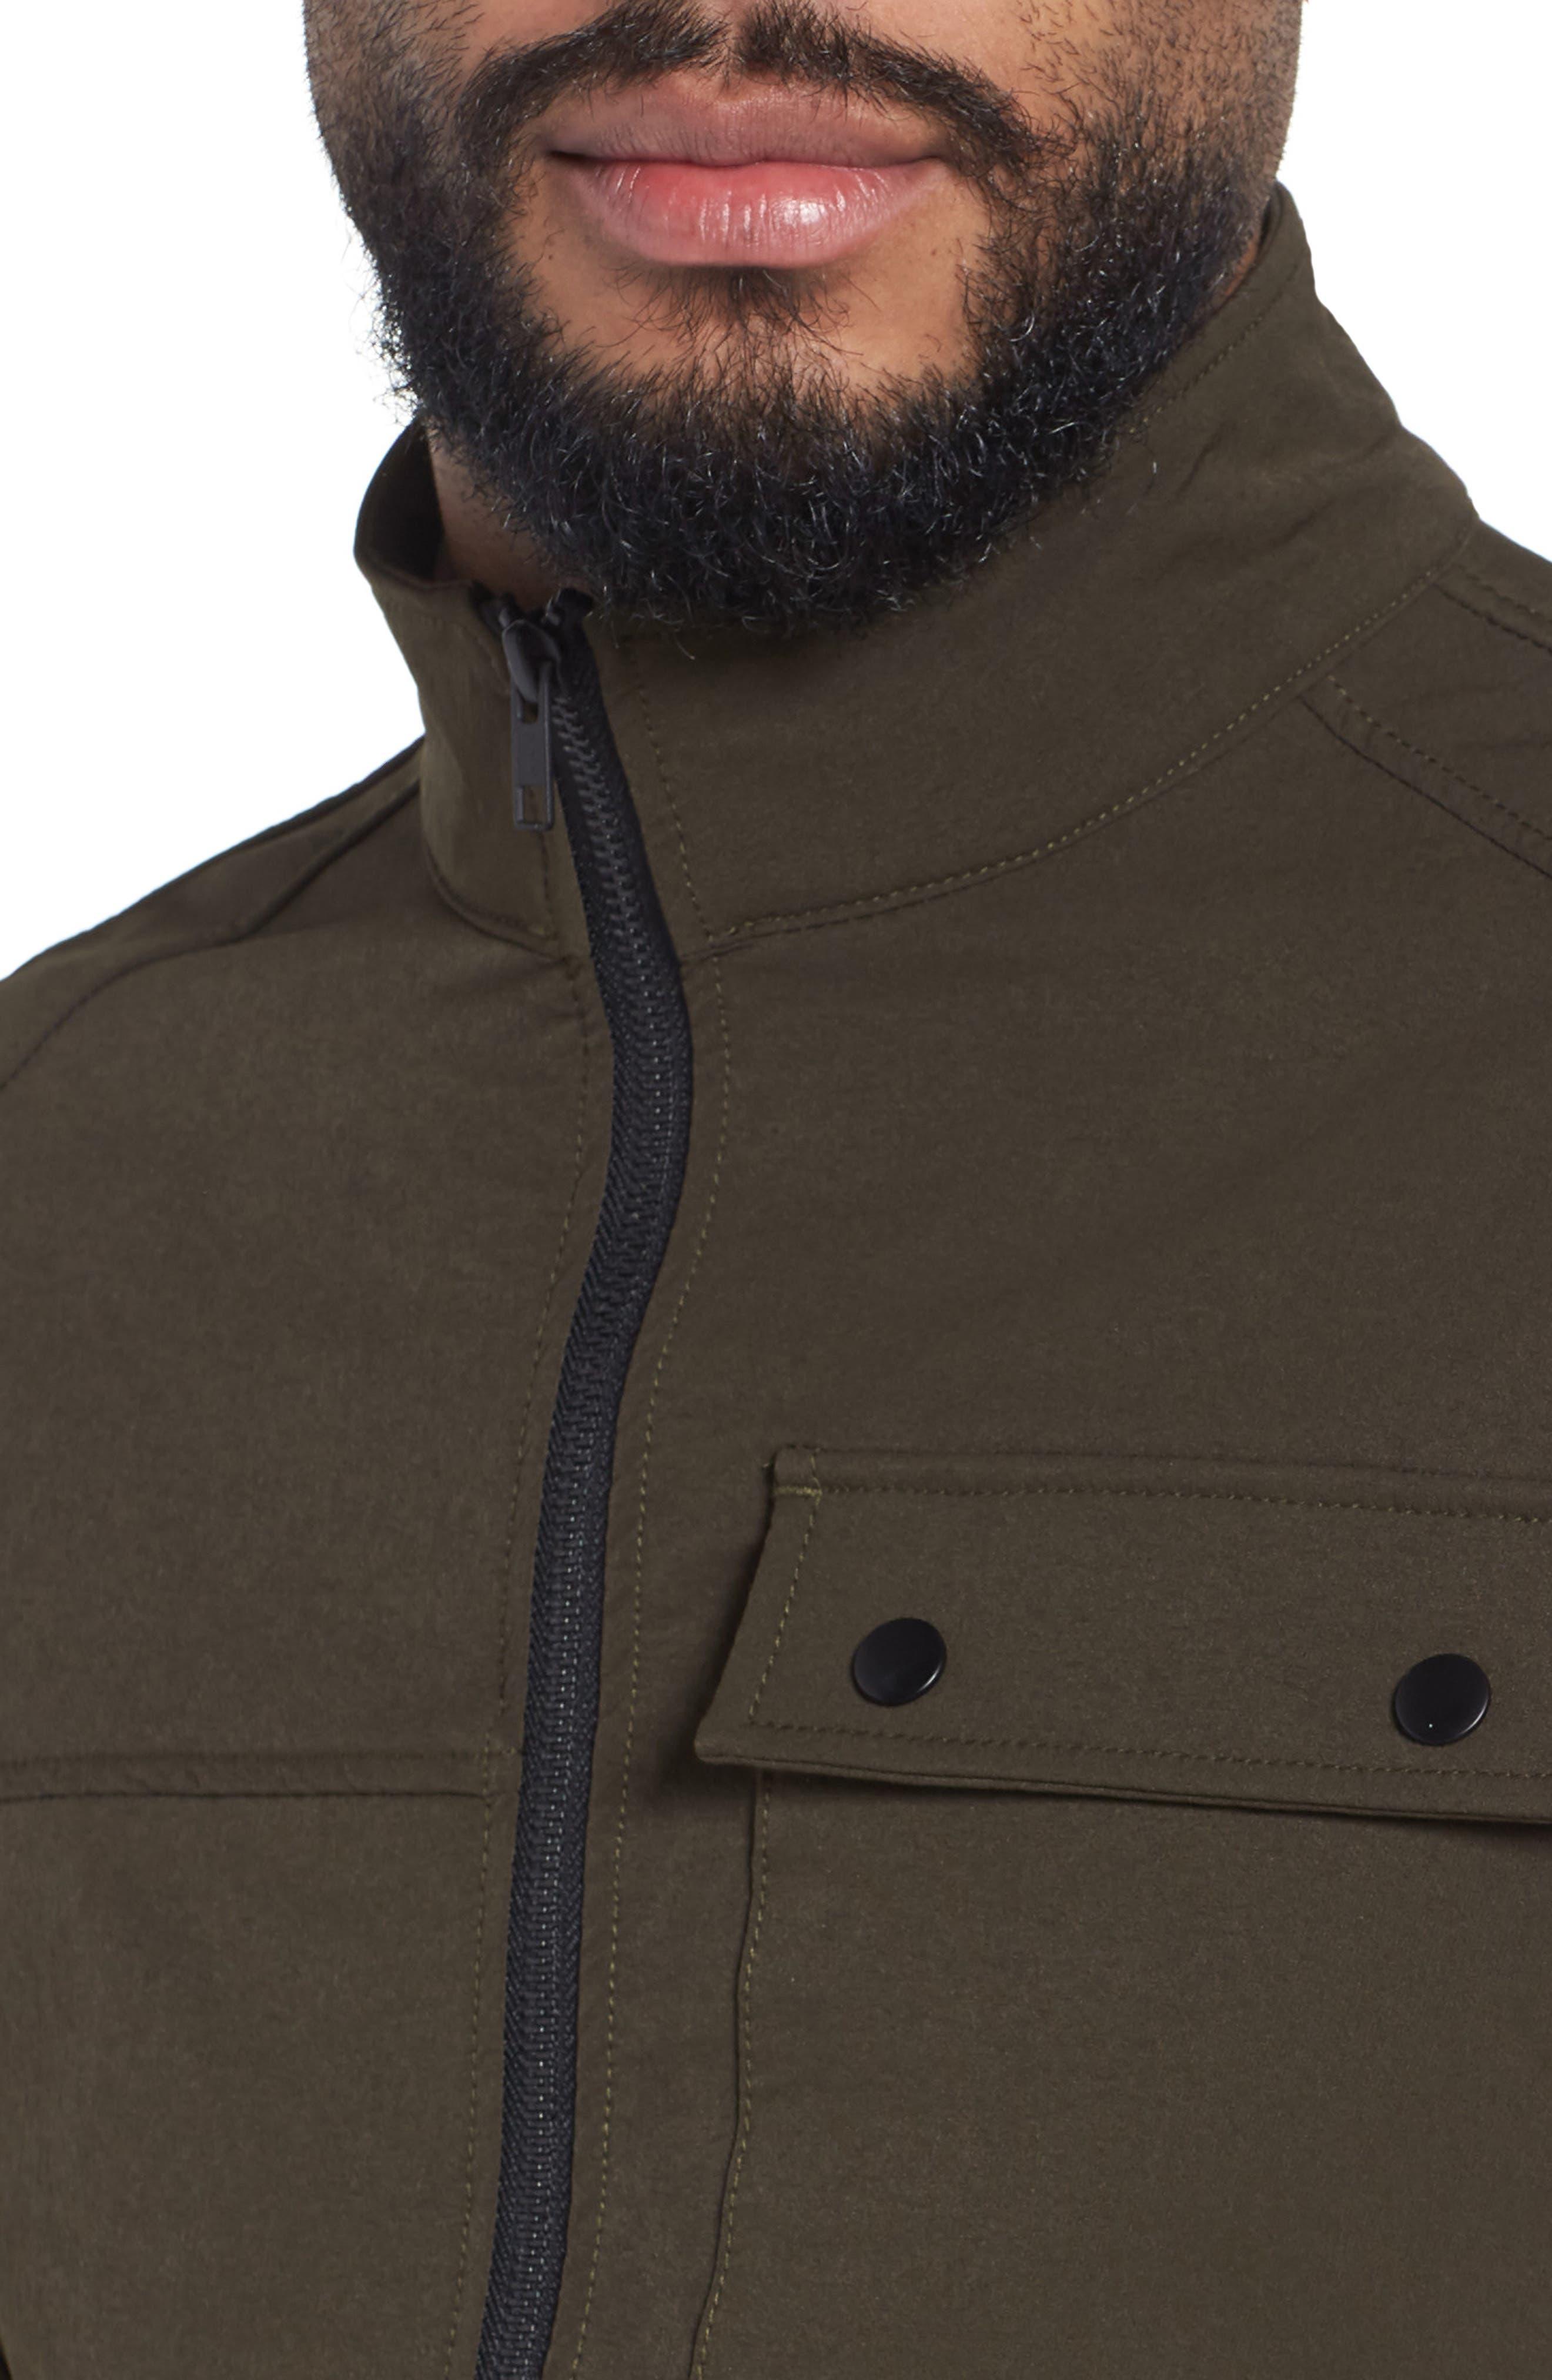 Tech Jacket,                             Alternate thumbnail 8, color,